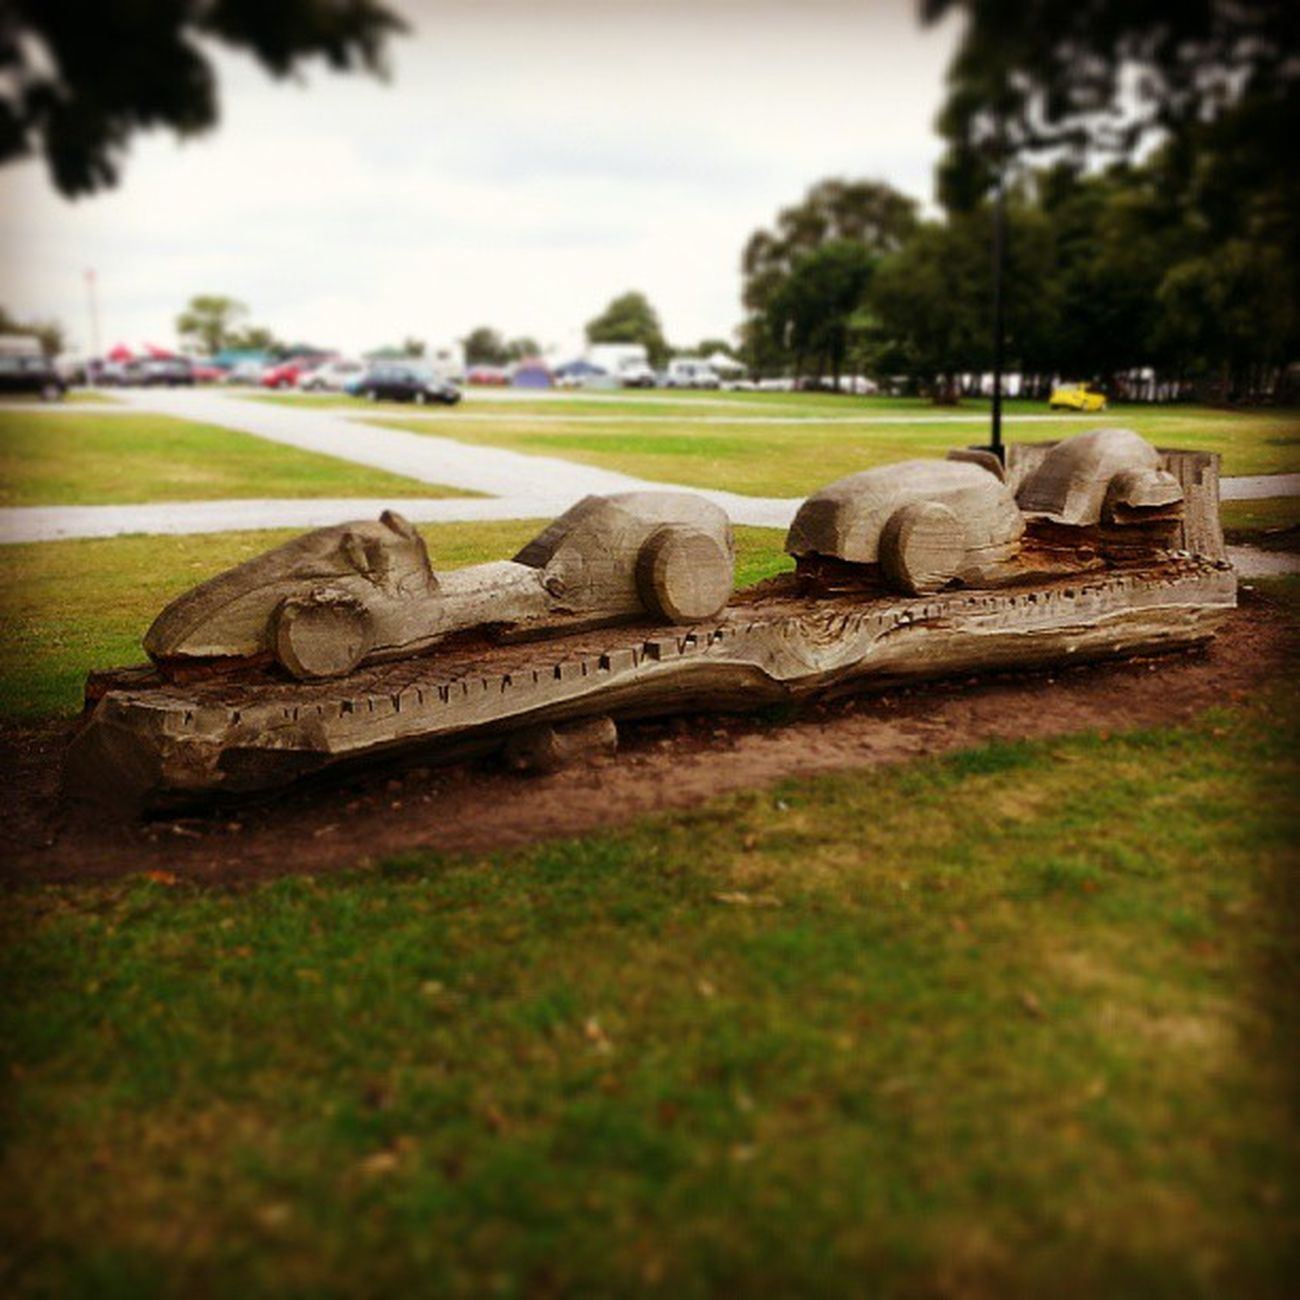 Playtime racing fun Oultonpark Racing Circuit Playground wooden sculpture car